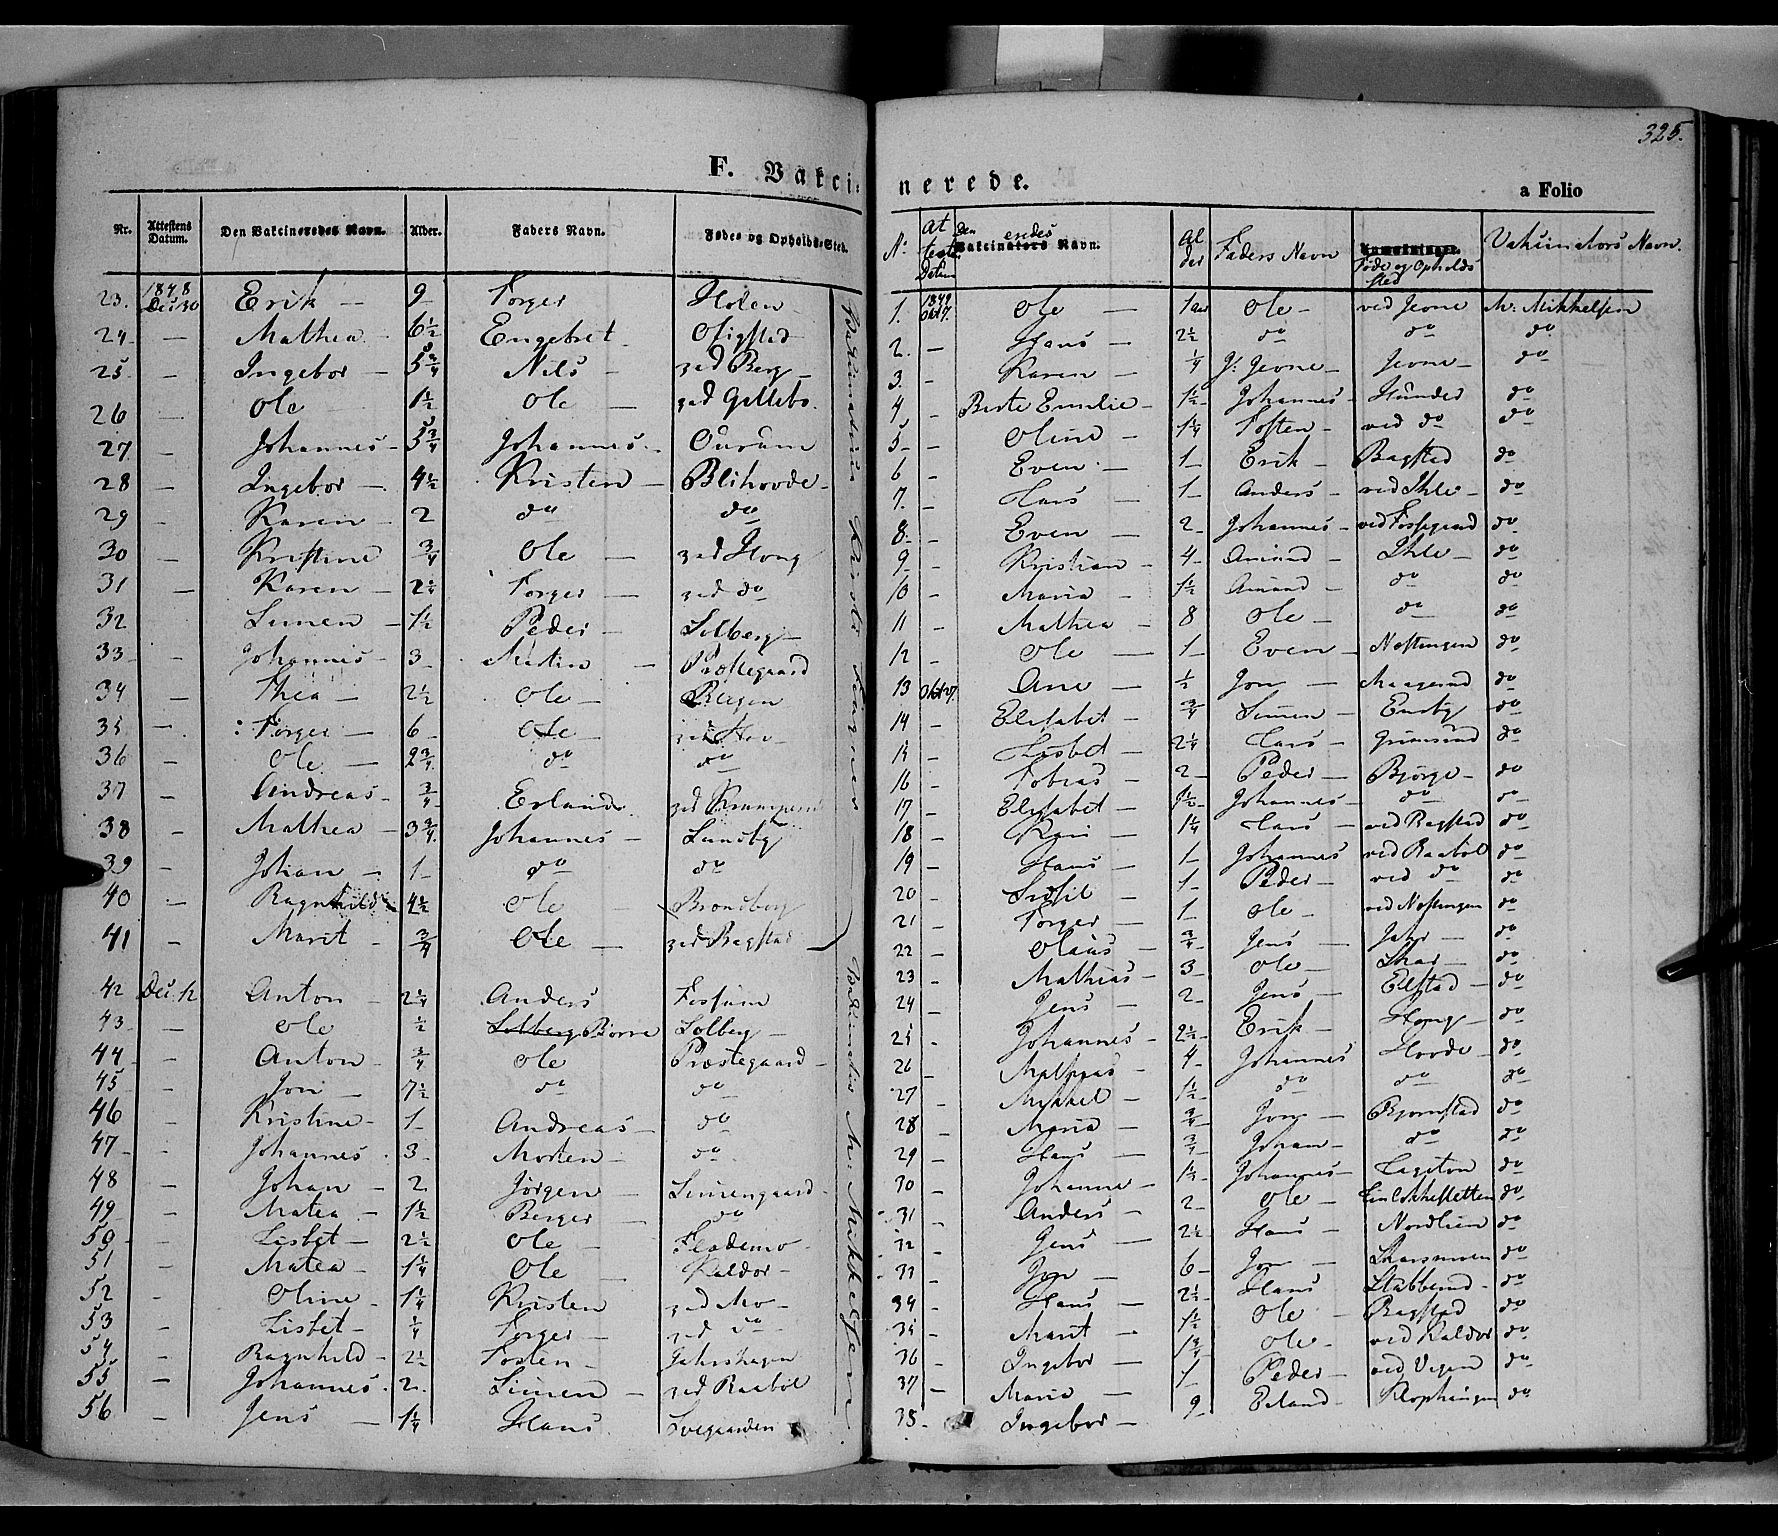 SAH, Øyer prestekontor, Ministerialbok nr. 5, 1842-1857, s. 325